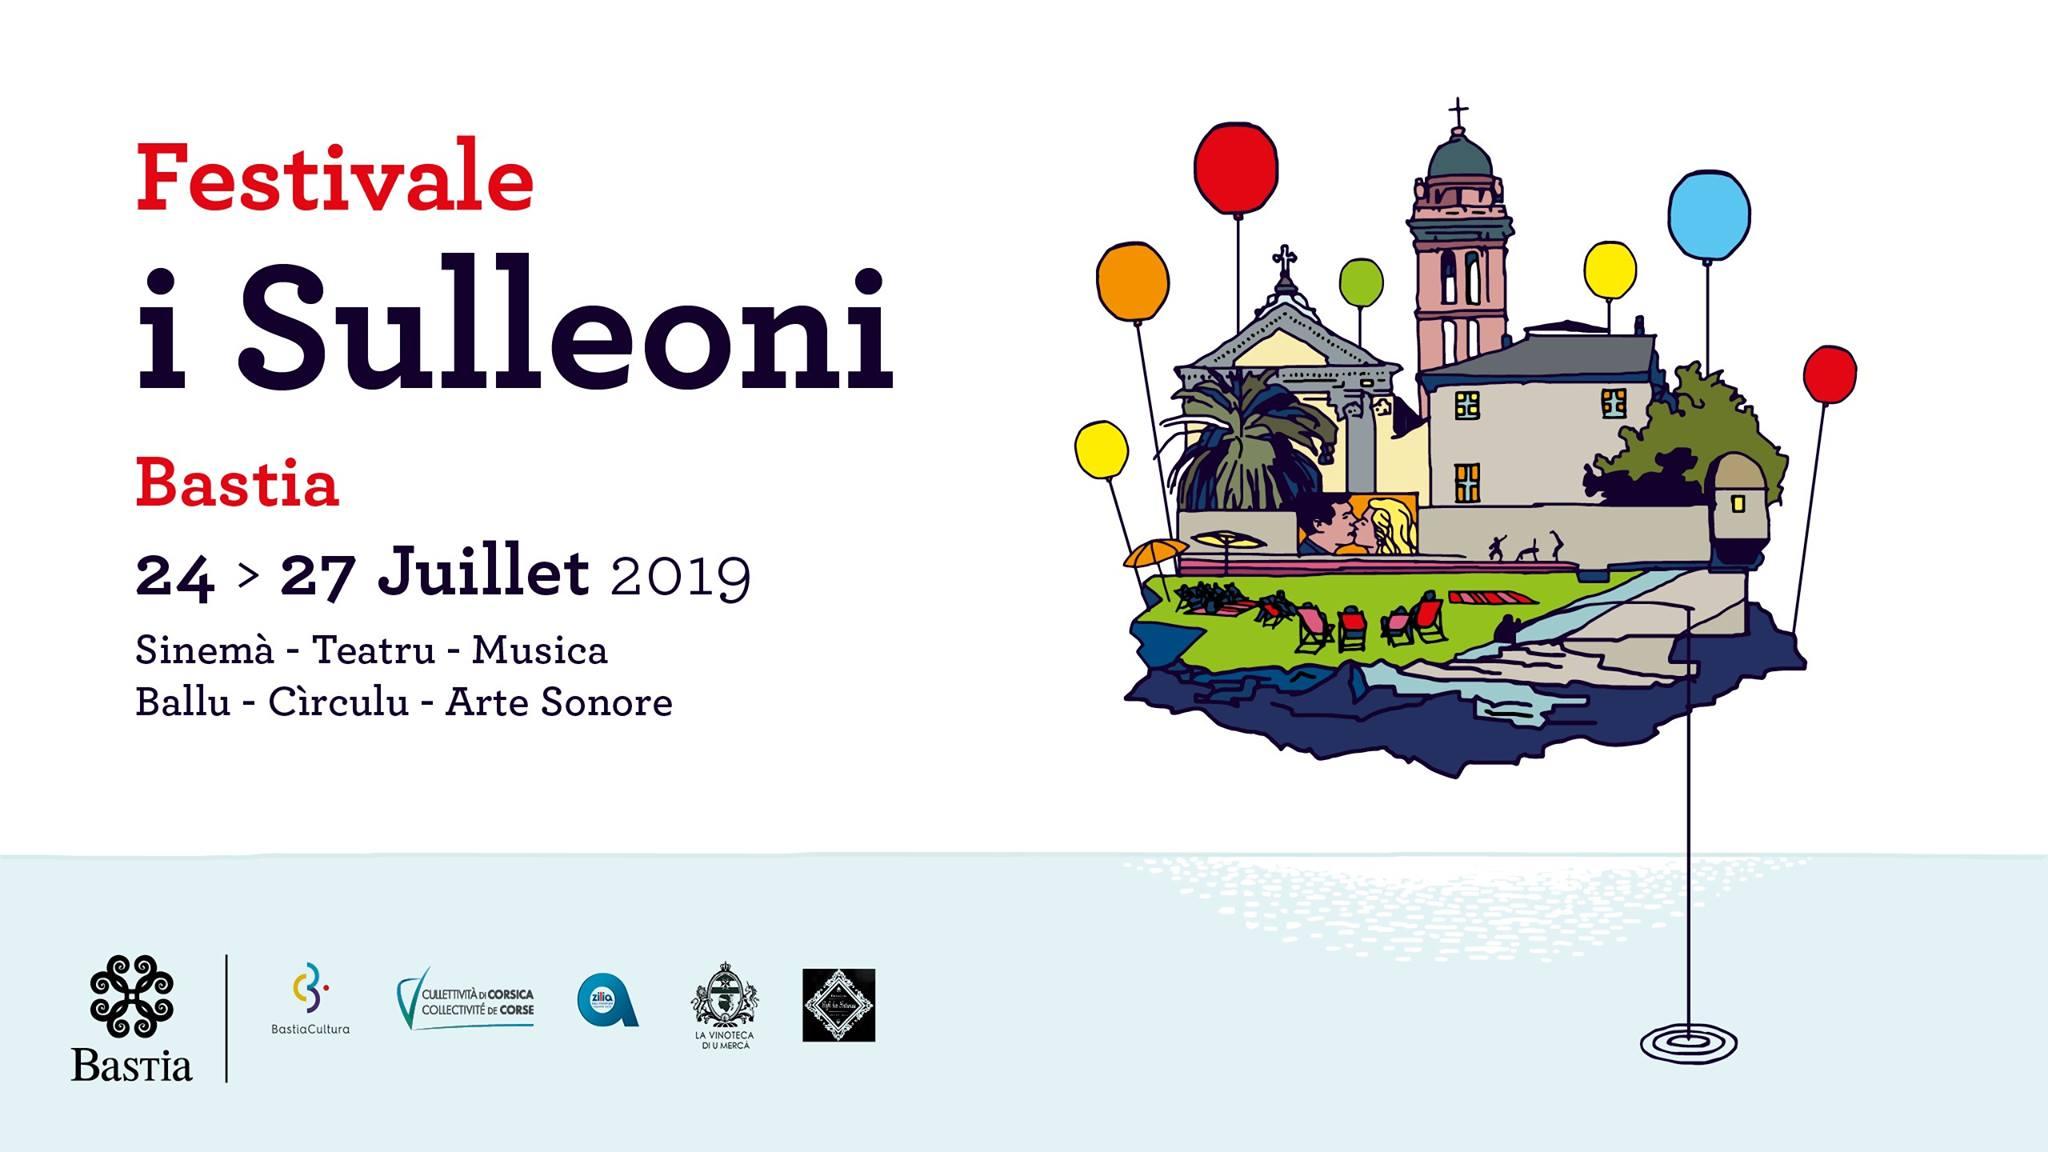 Festivale I Sulleoni: 5e édition